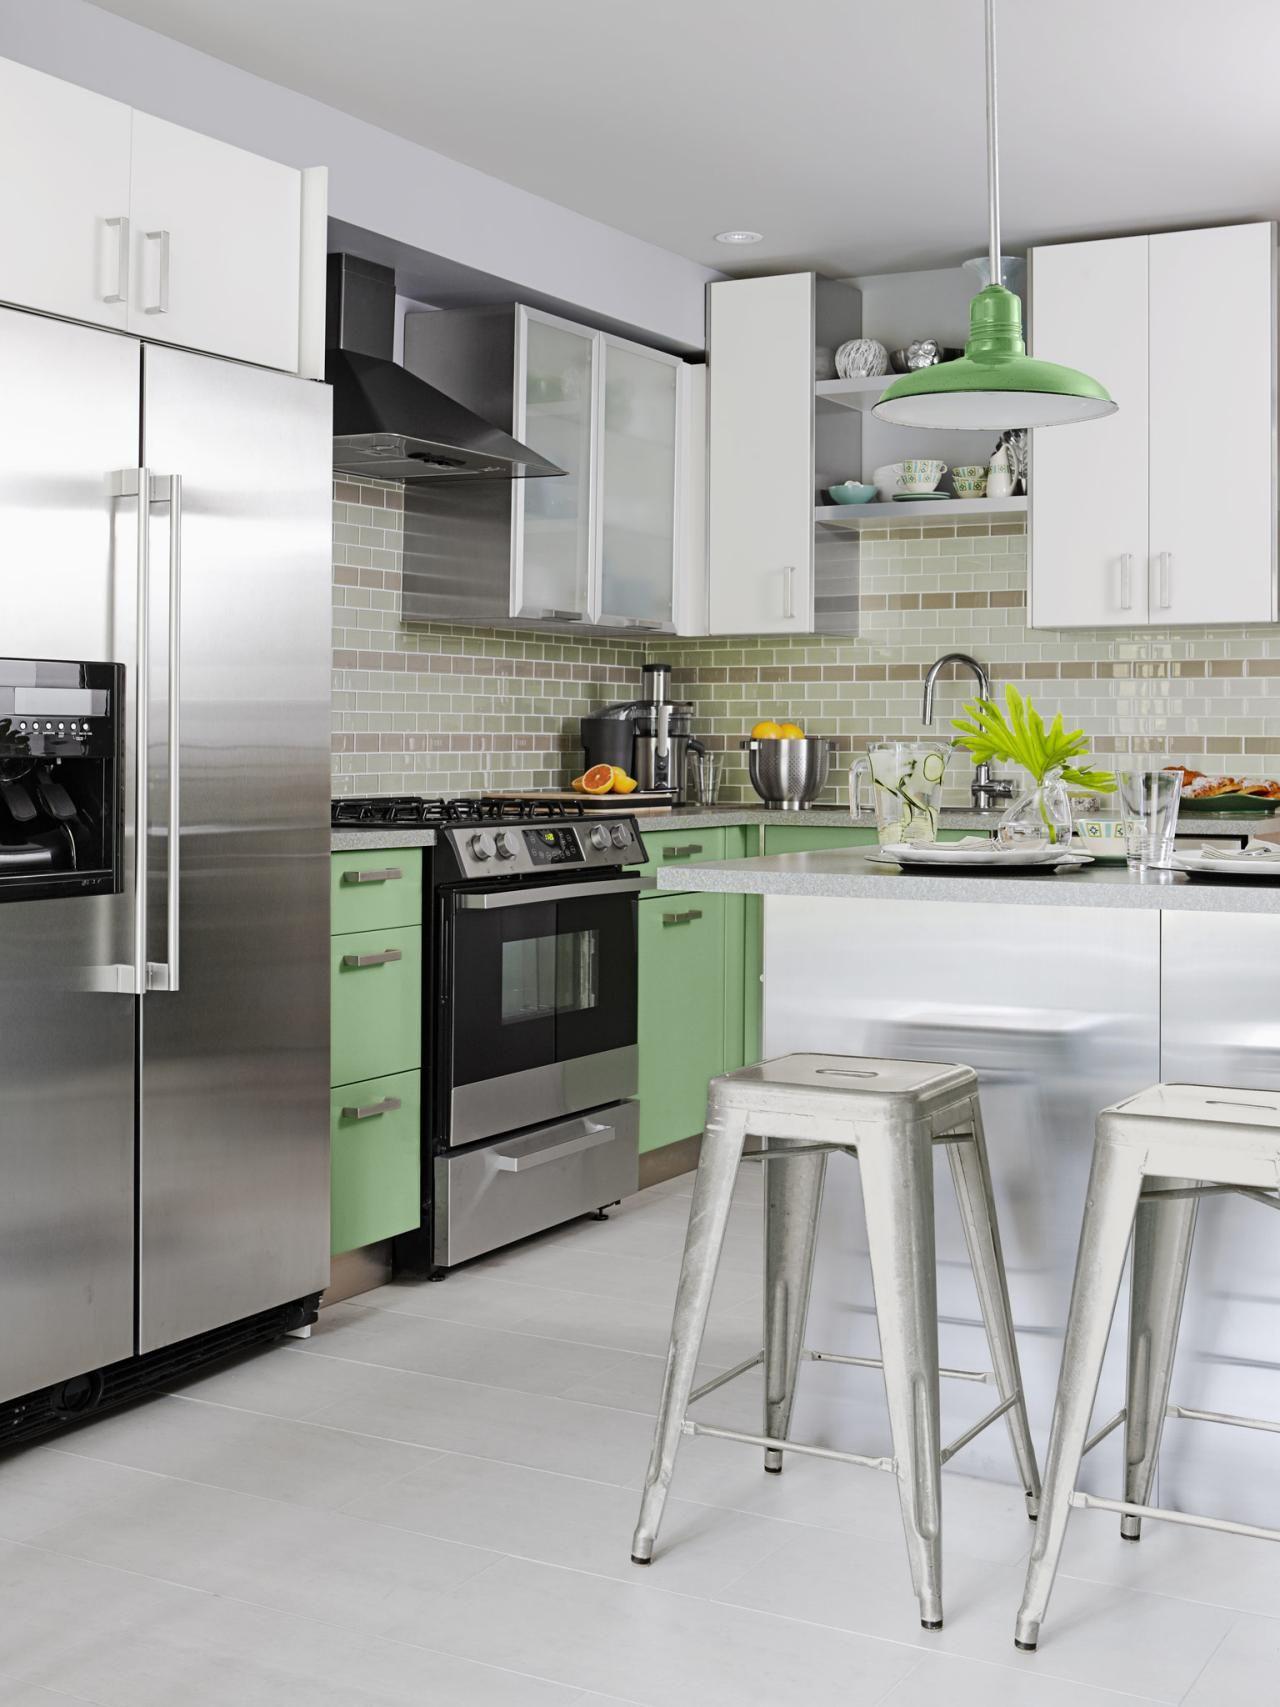 Kitchen design tips from hgtvus sarah richardson base cabinets